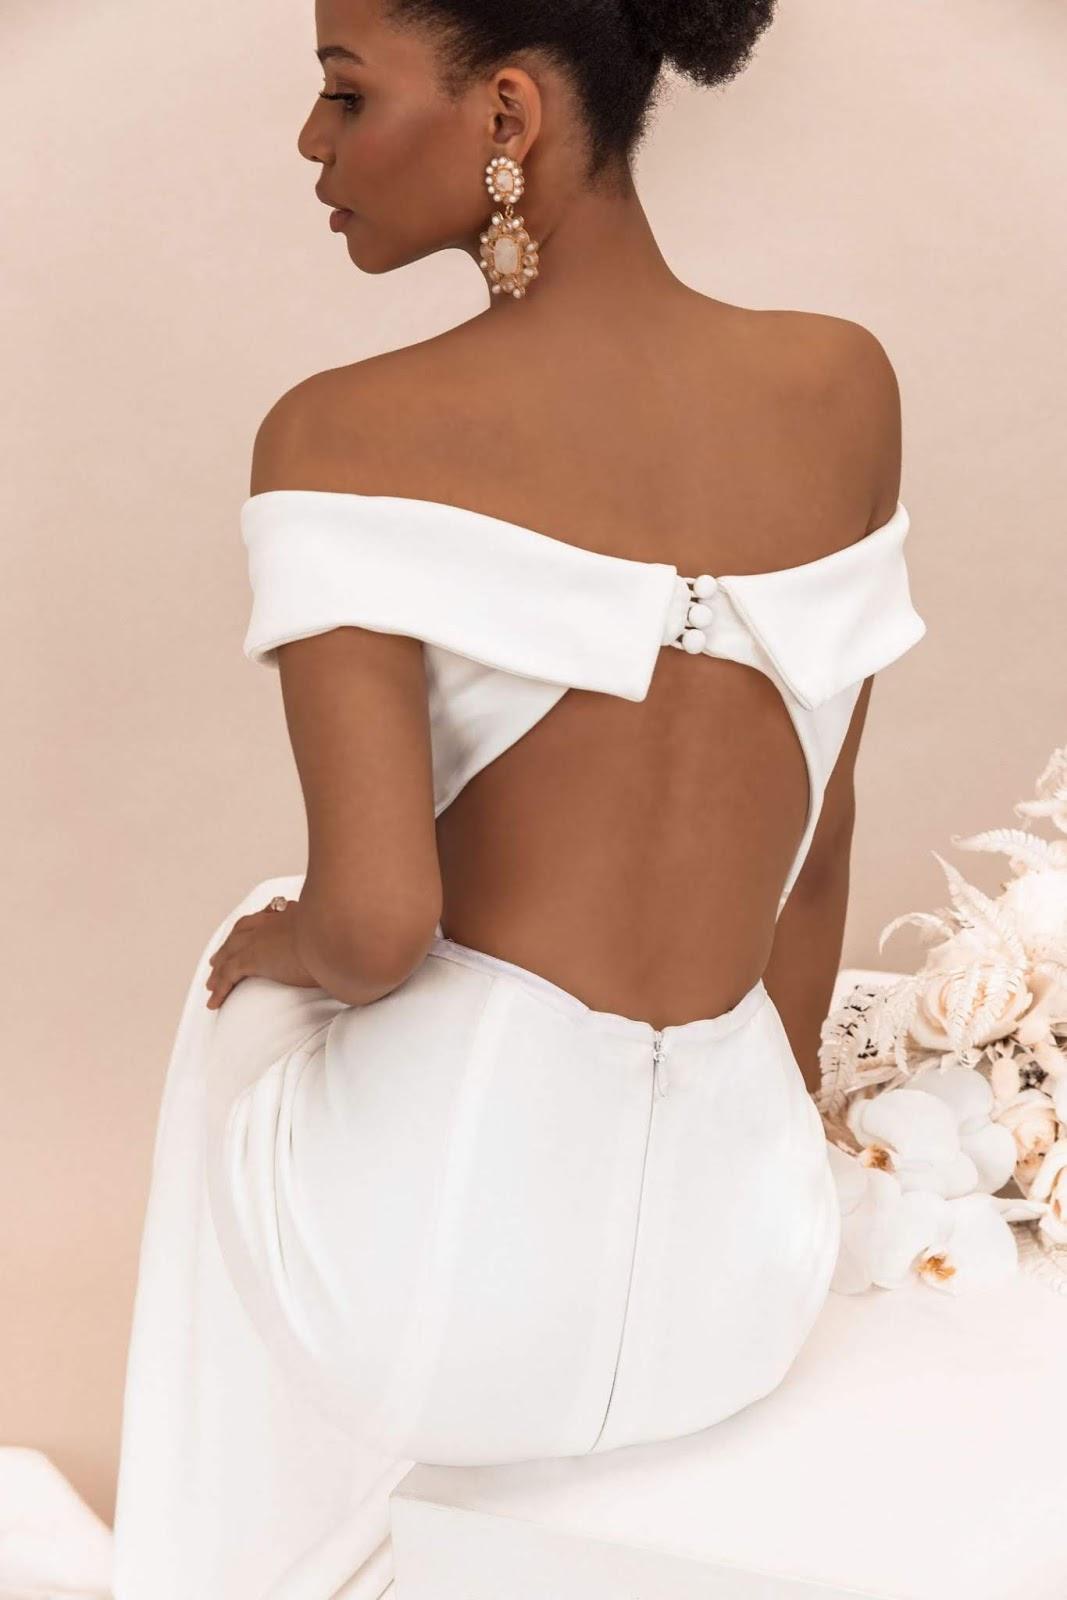 lauren shulz visuals bridal gowns australian designer wedding dress